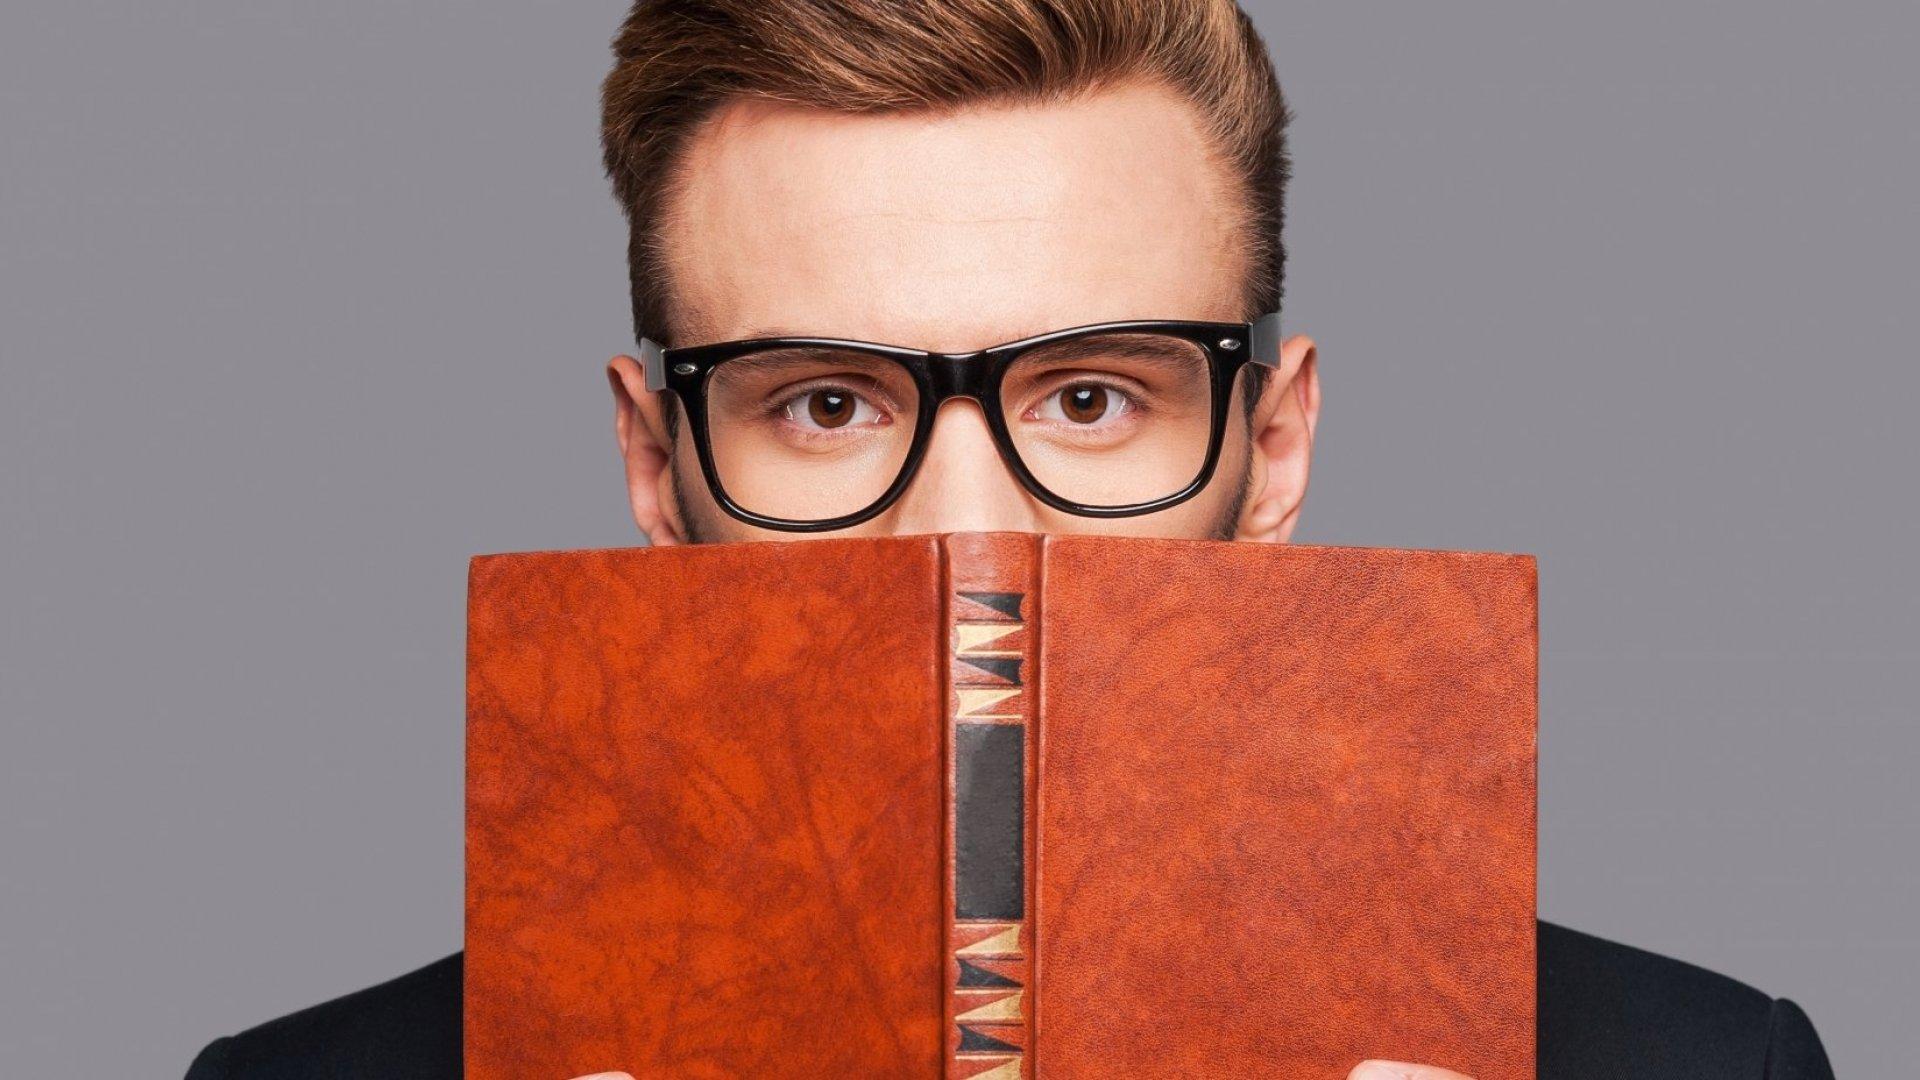 The 1 Habit All Intelligent People Practice